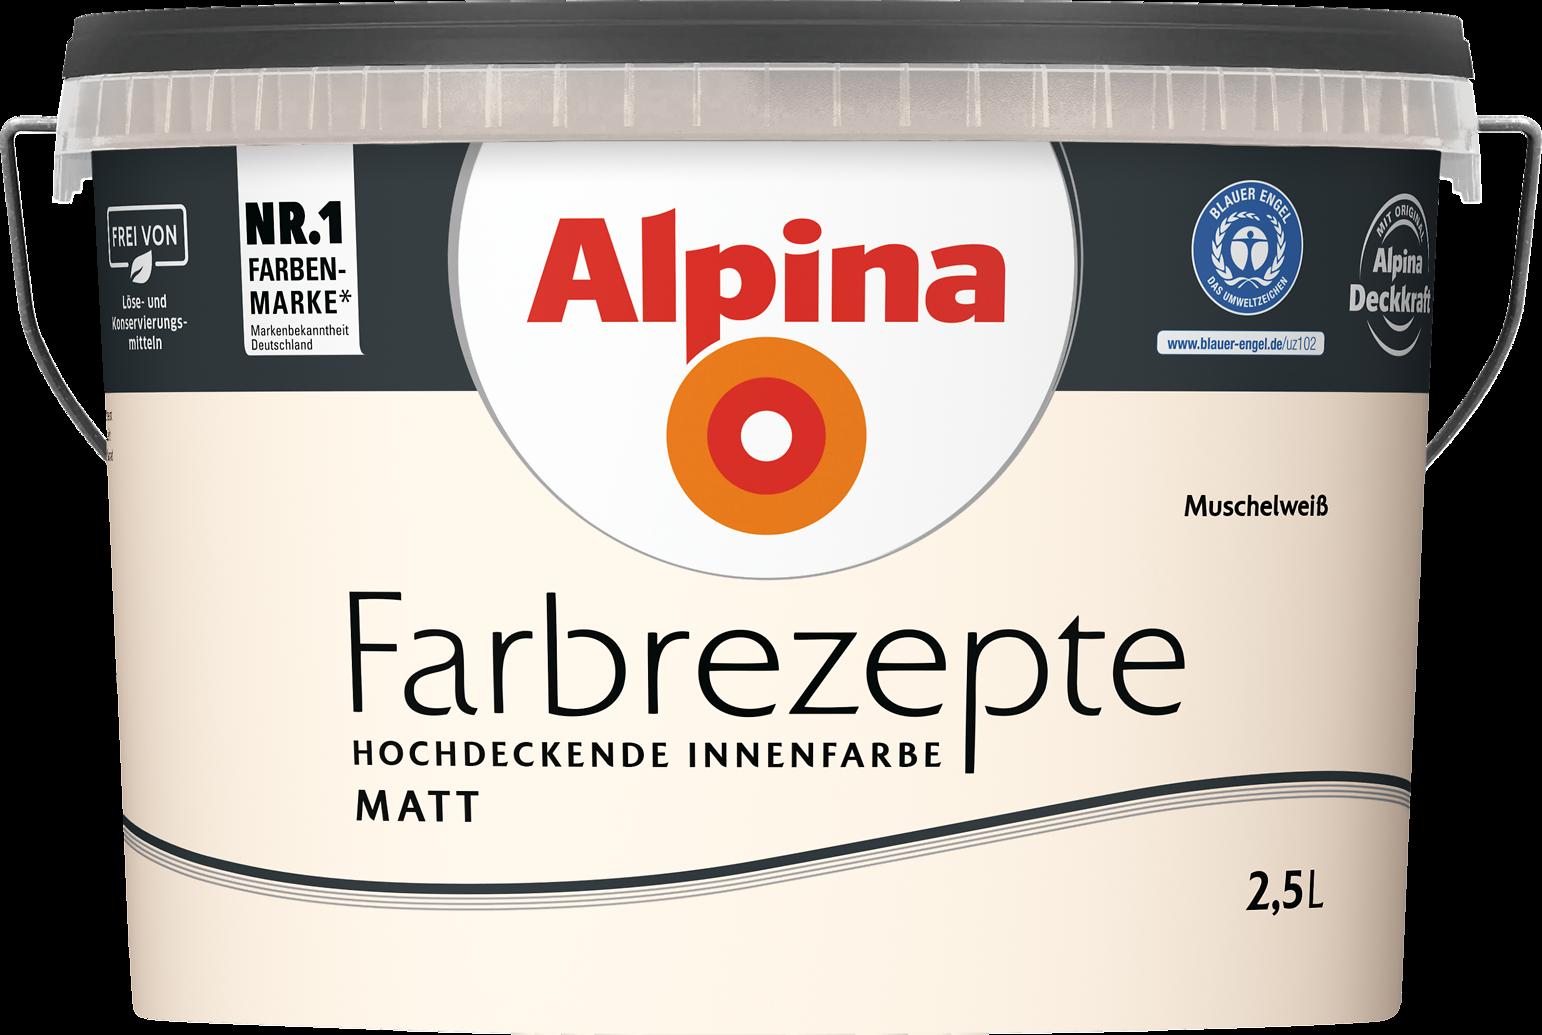 Alpina Farbrezepte Innenfarbe U201eMuschelweißu201c